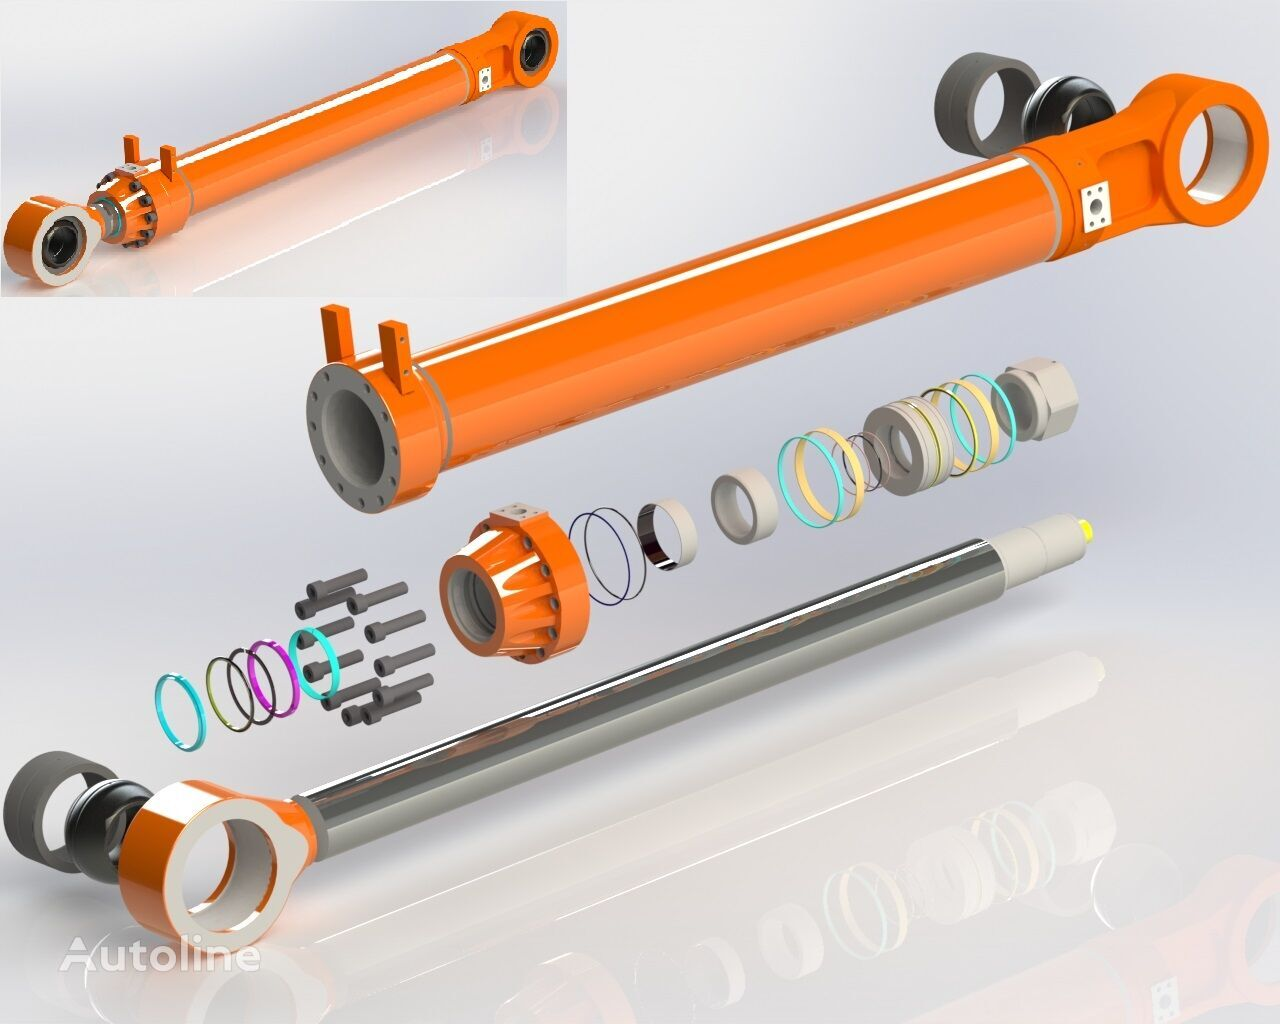 HITACHI BOOM / ARM / BUCKET CYLINDERS hydraulic cylinder for HITACHI EX3600 excavator for parts